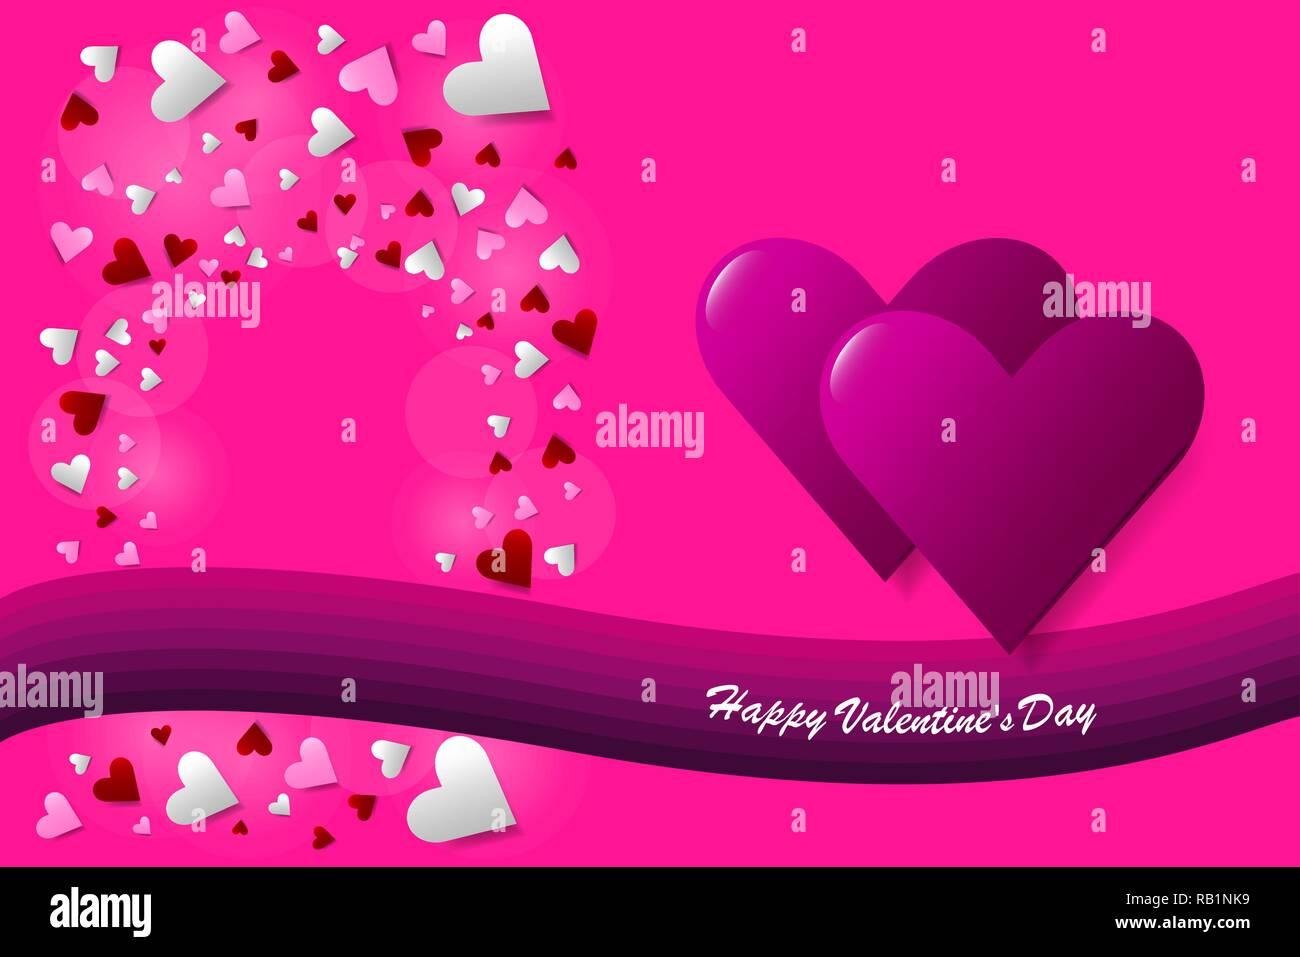 pink hearts theme - Isken kaptanband co